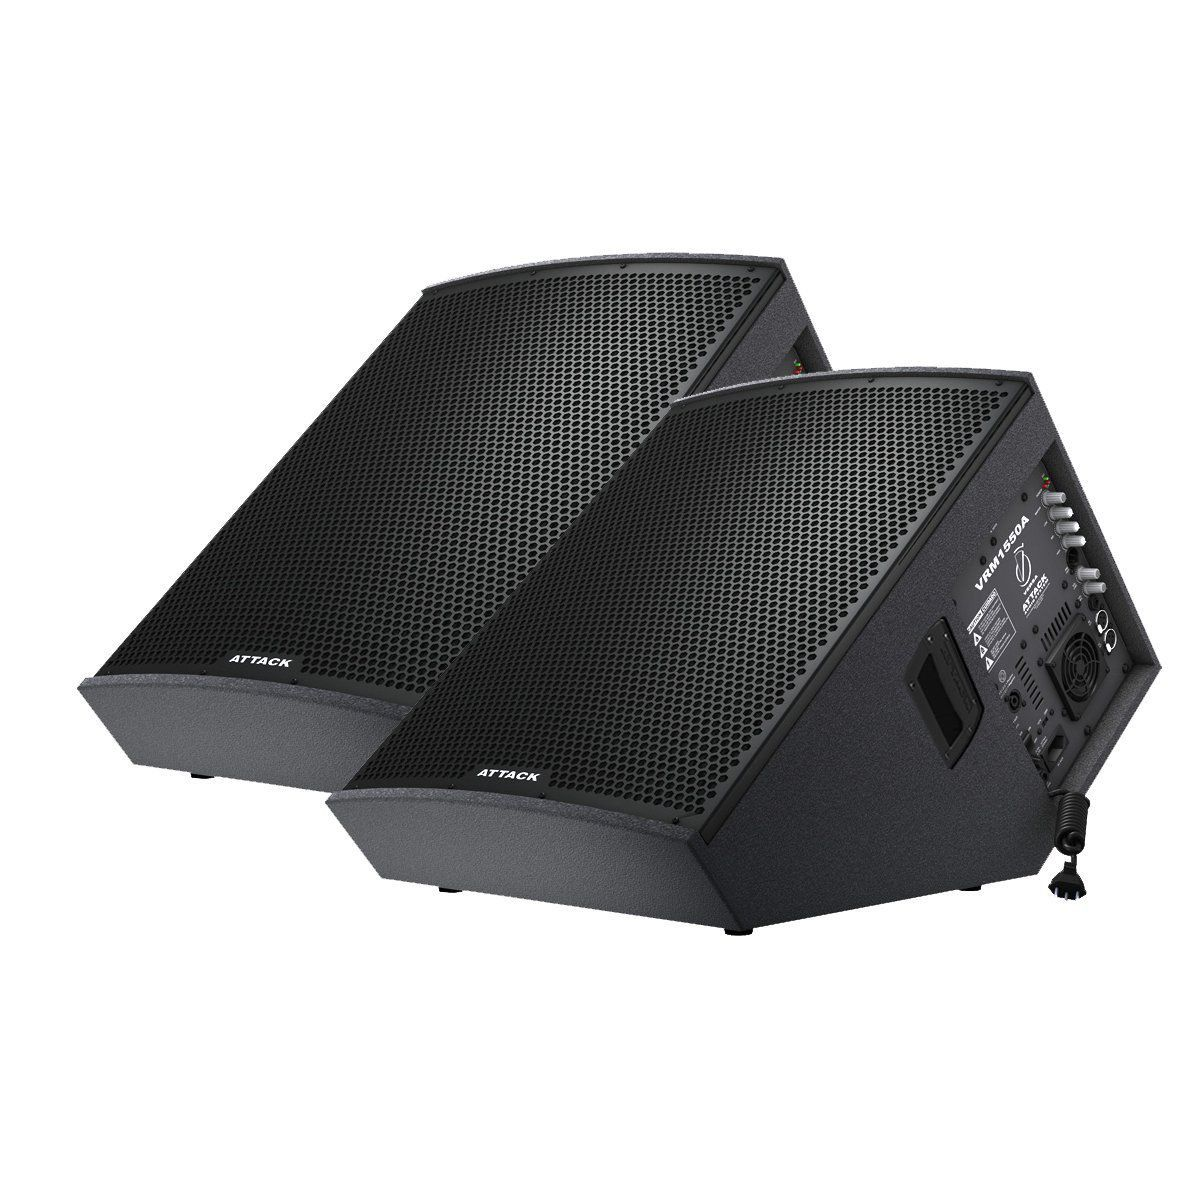 Kit 2 Caixas Monitor de PalcoVRM1550 Ativa + VRM1530 Passiva Attack